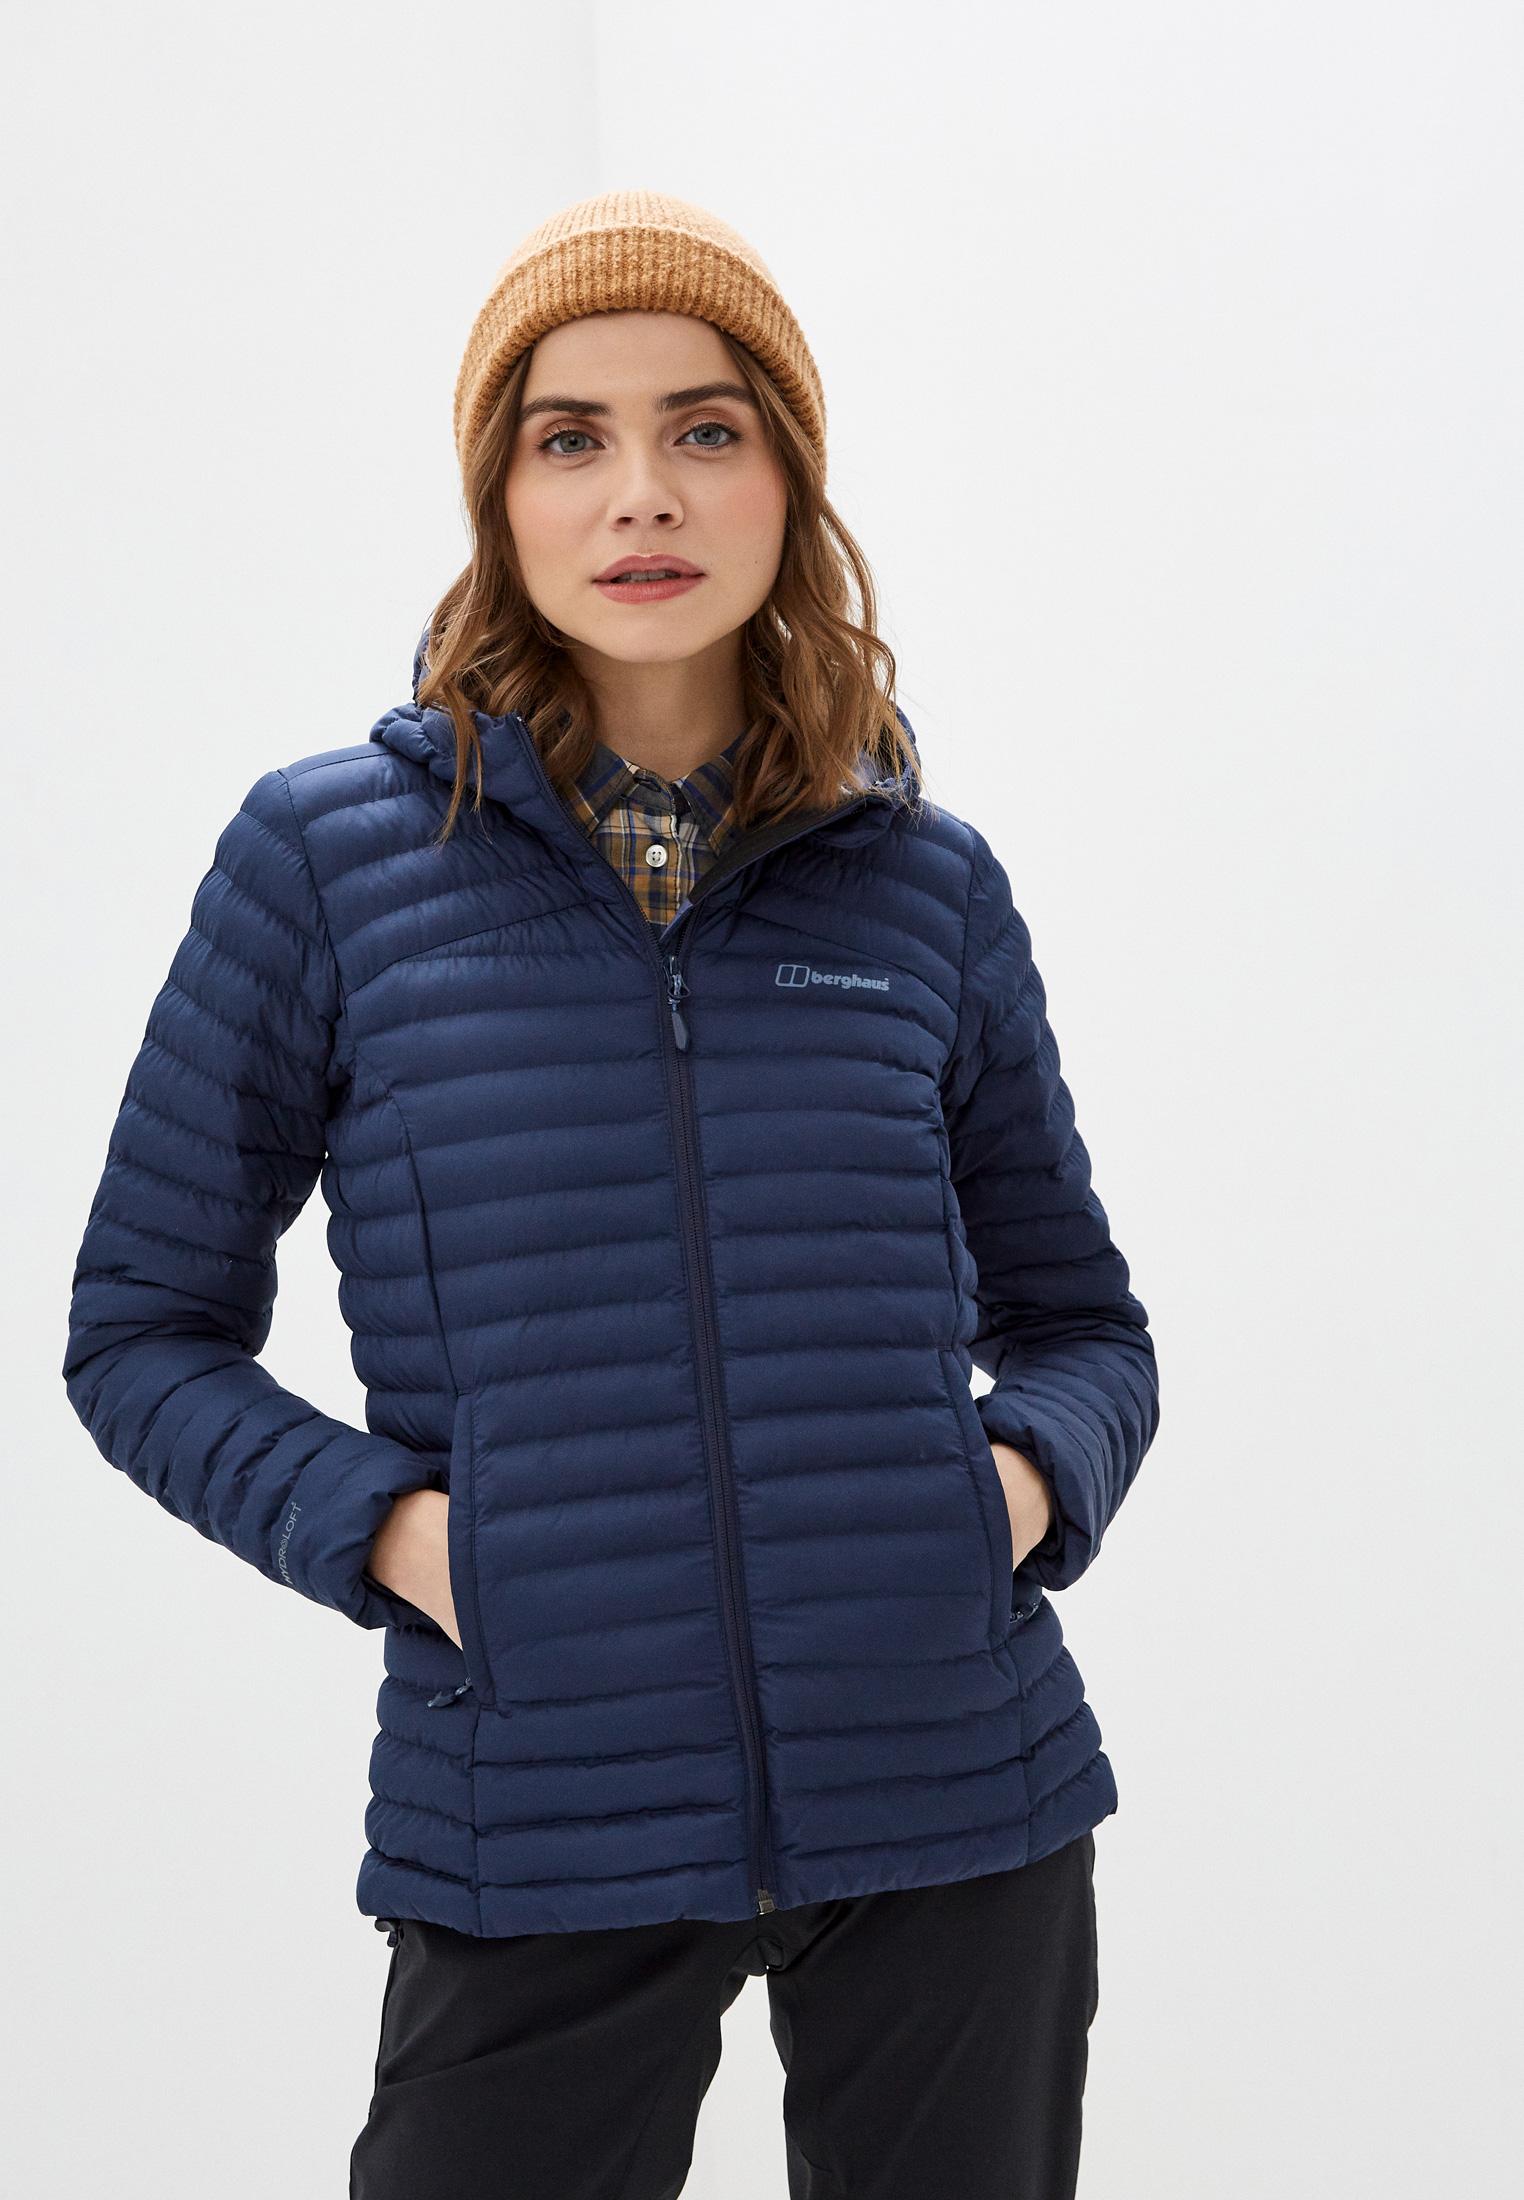 Женская верхняя одежда Berghaus 4A000780